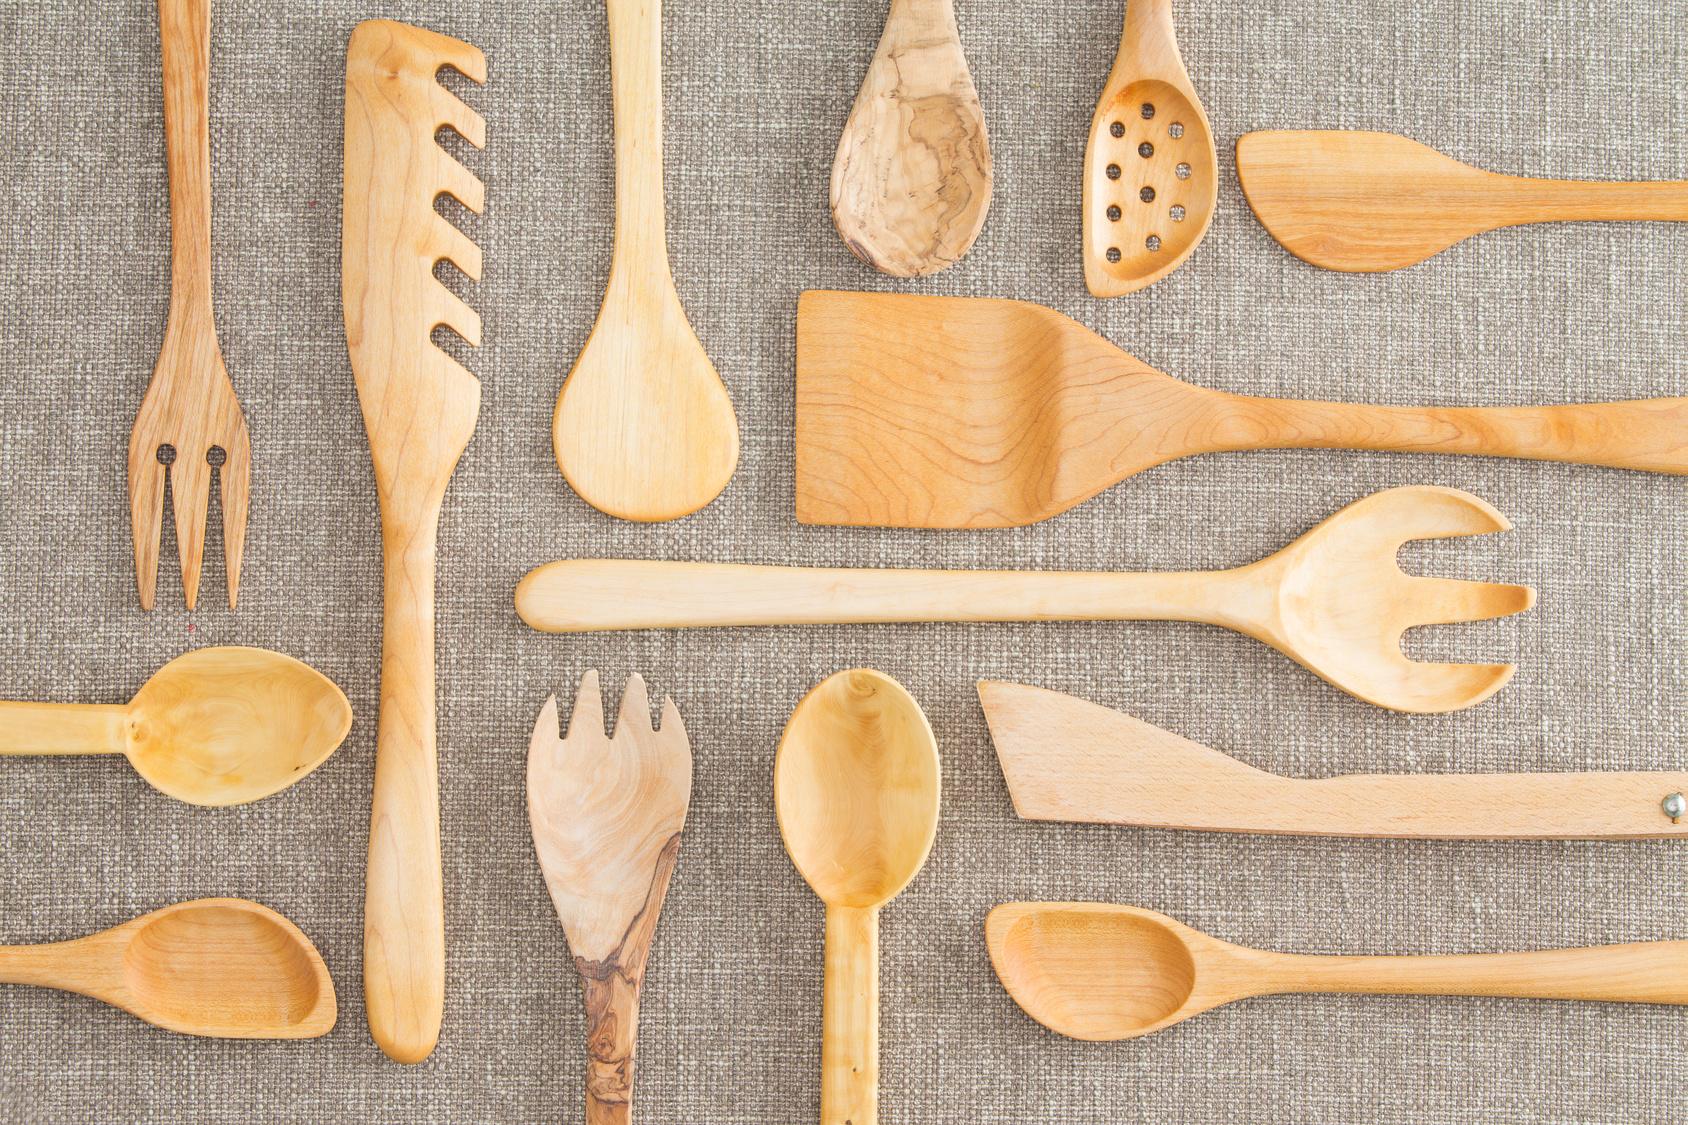 Top 5 Camping Cooking Necessities